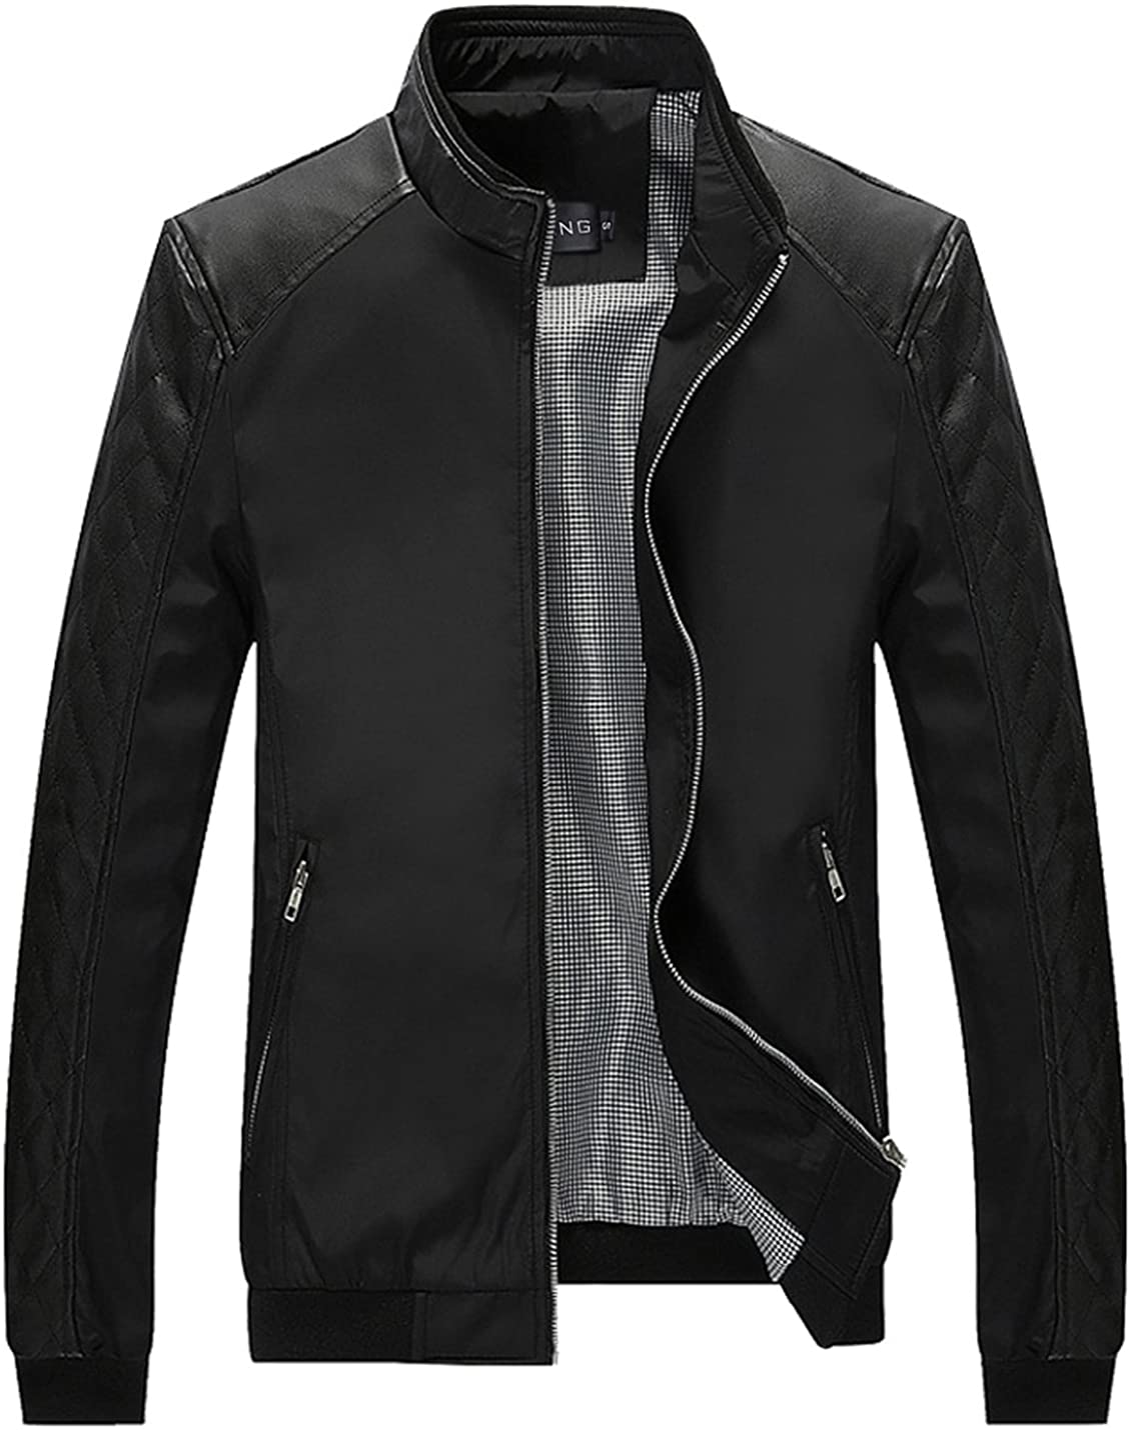 Tanming Men's Casual Slim Fit Lightweight Zip Up Softshell Bomber Jacket